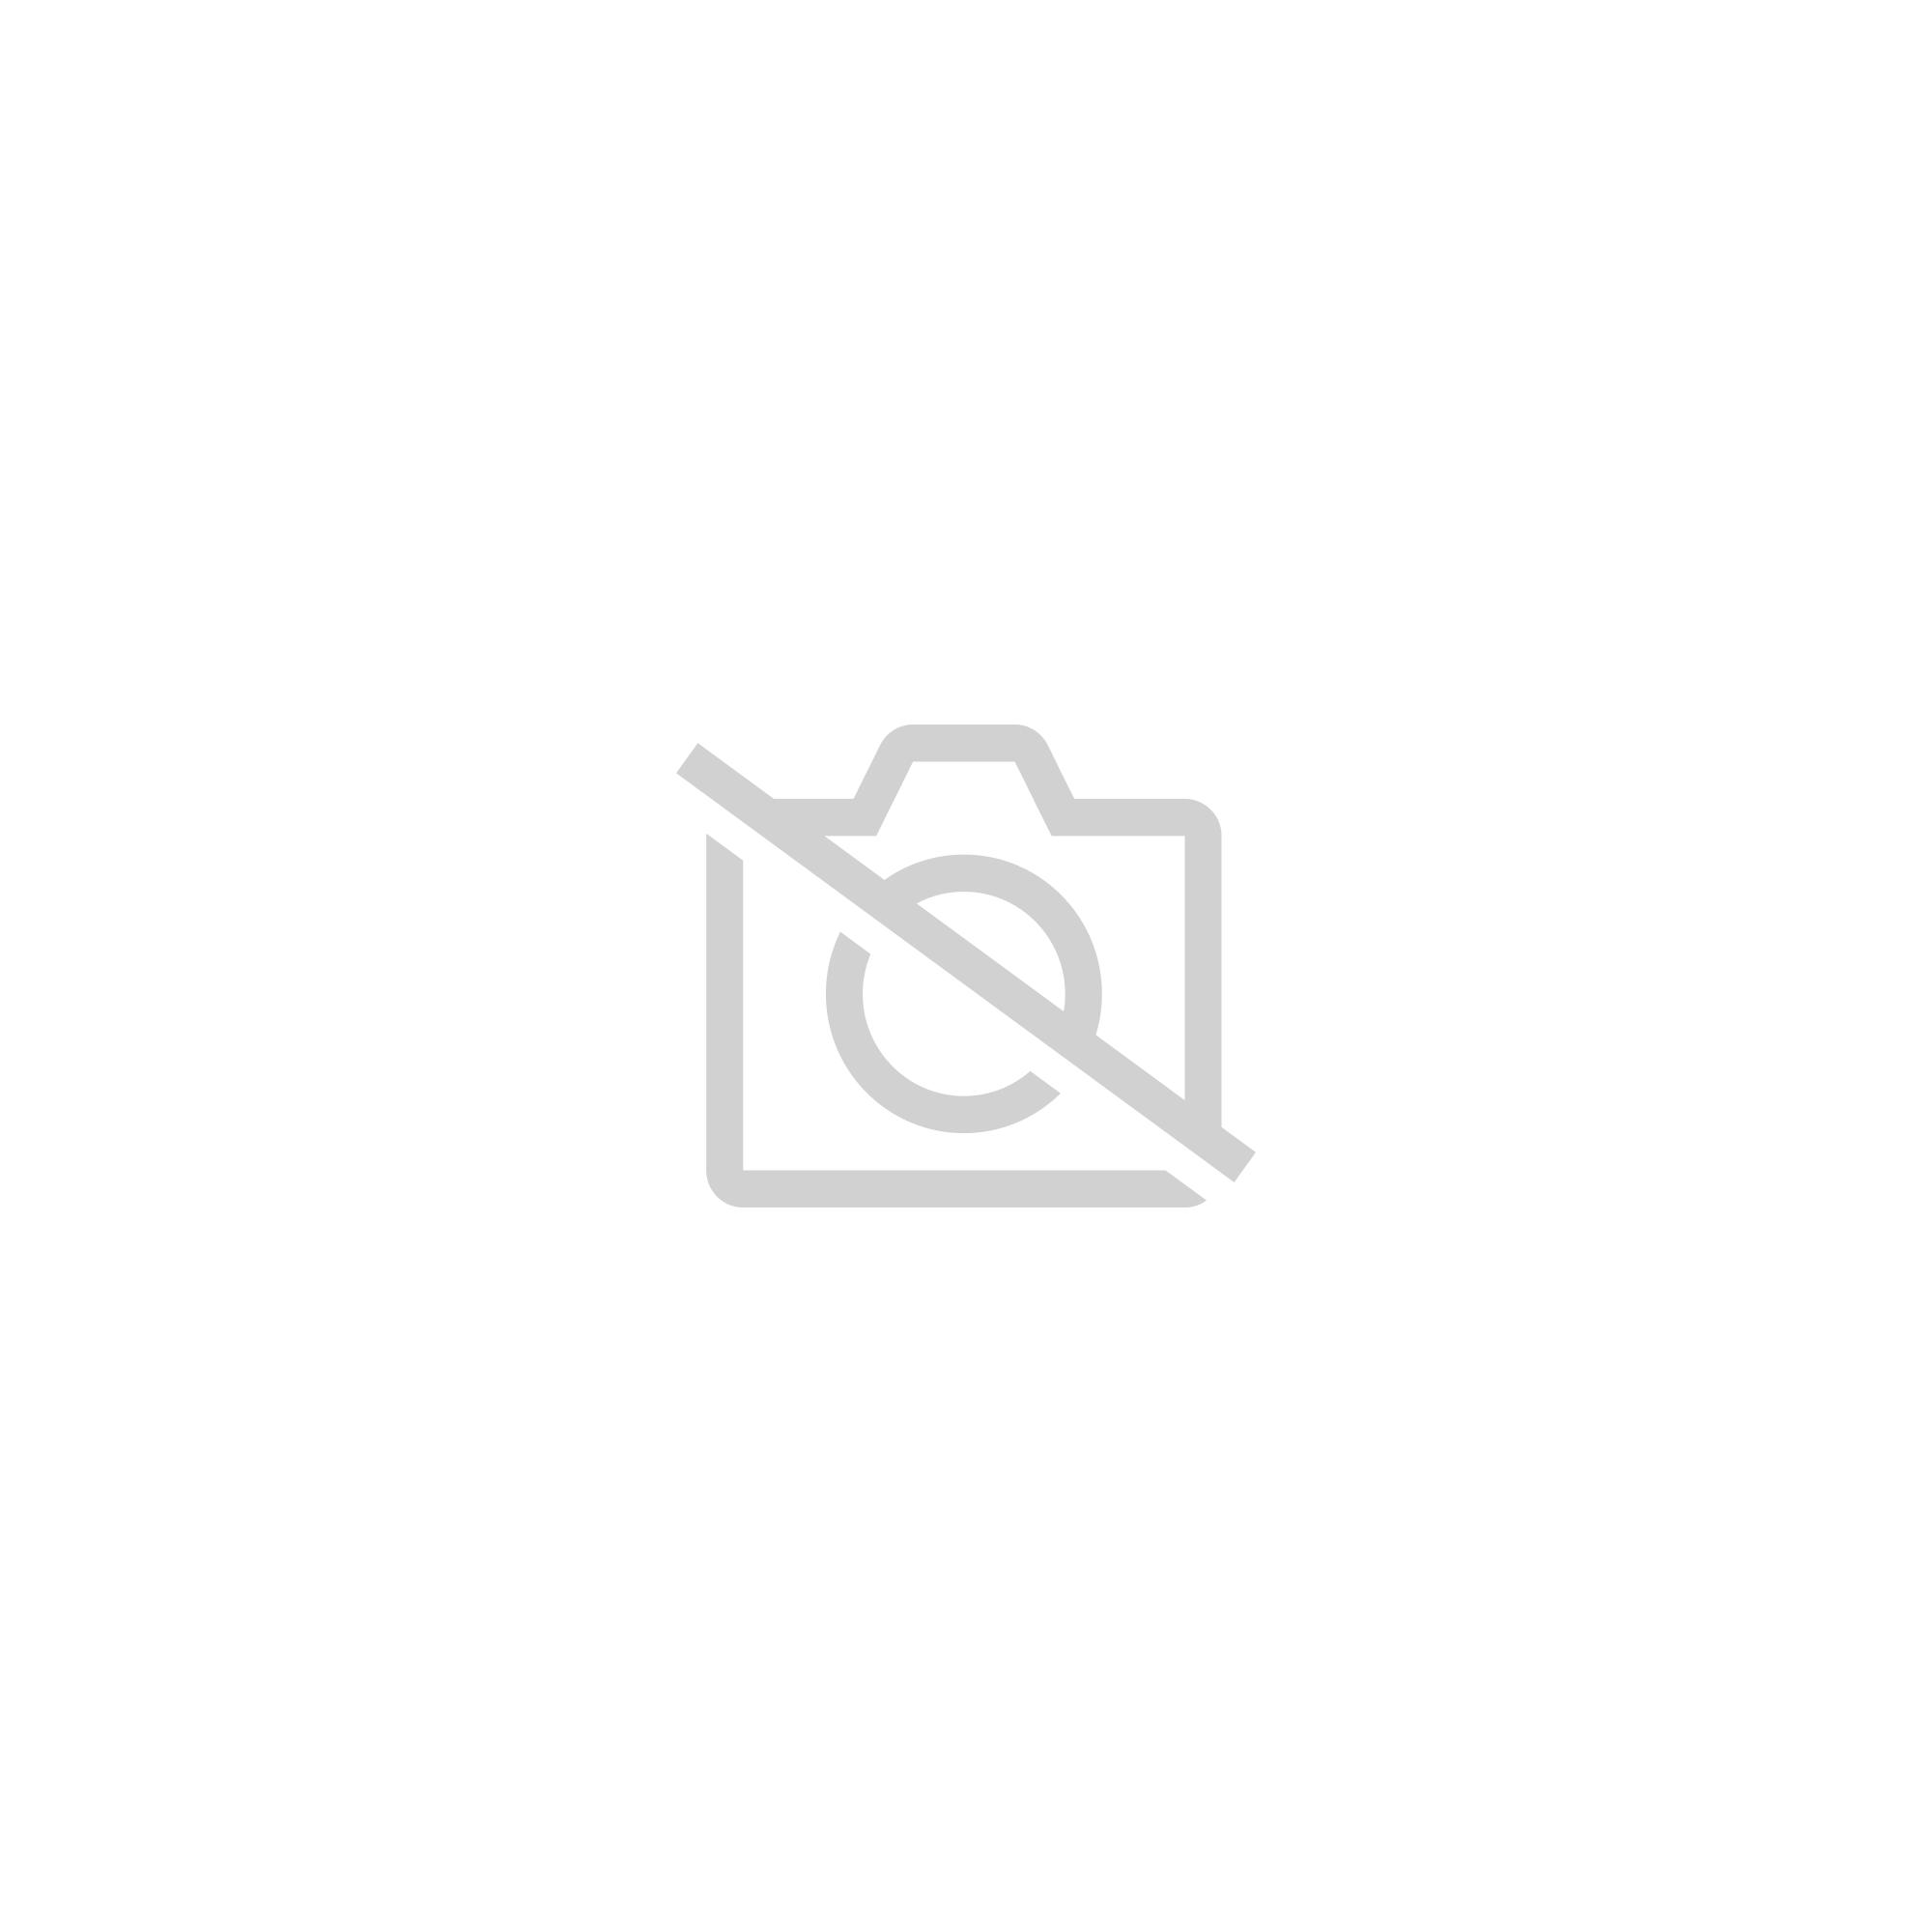 Grand Avion Polly Pocket